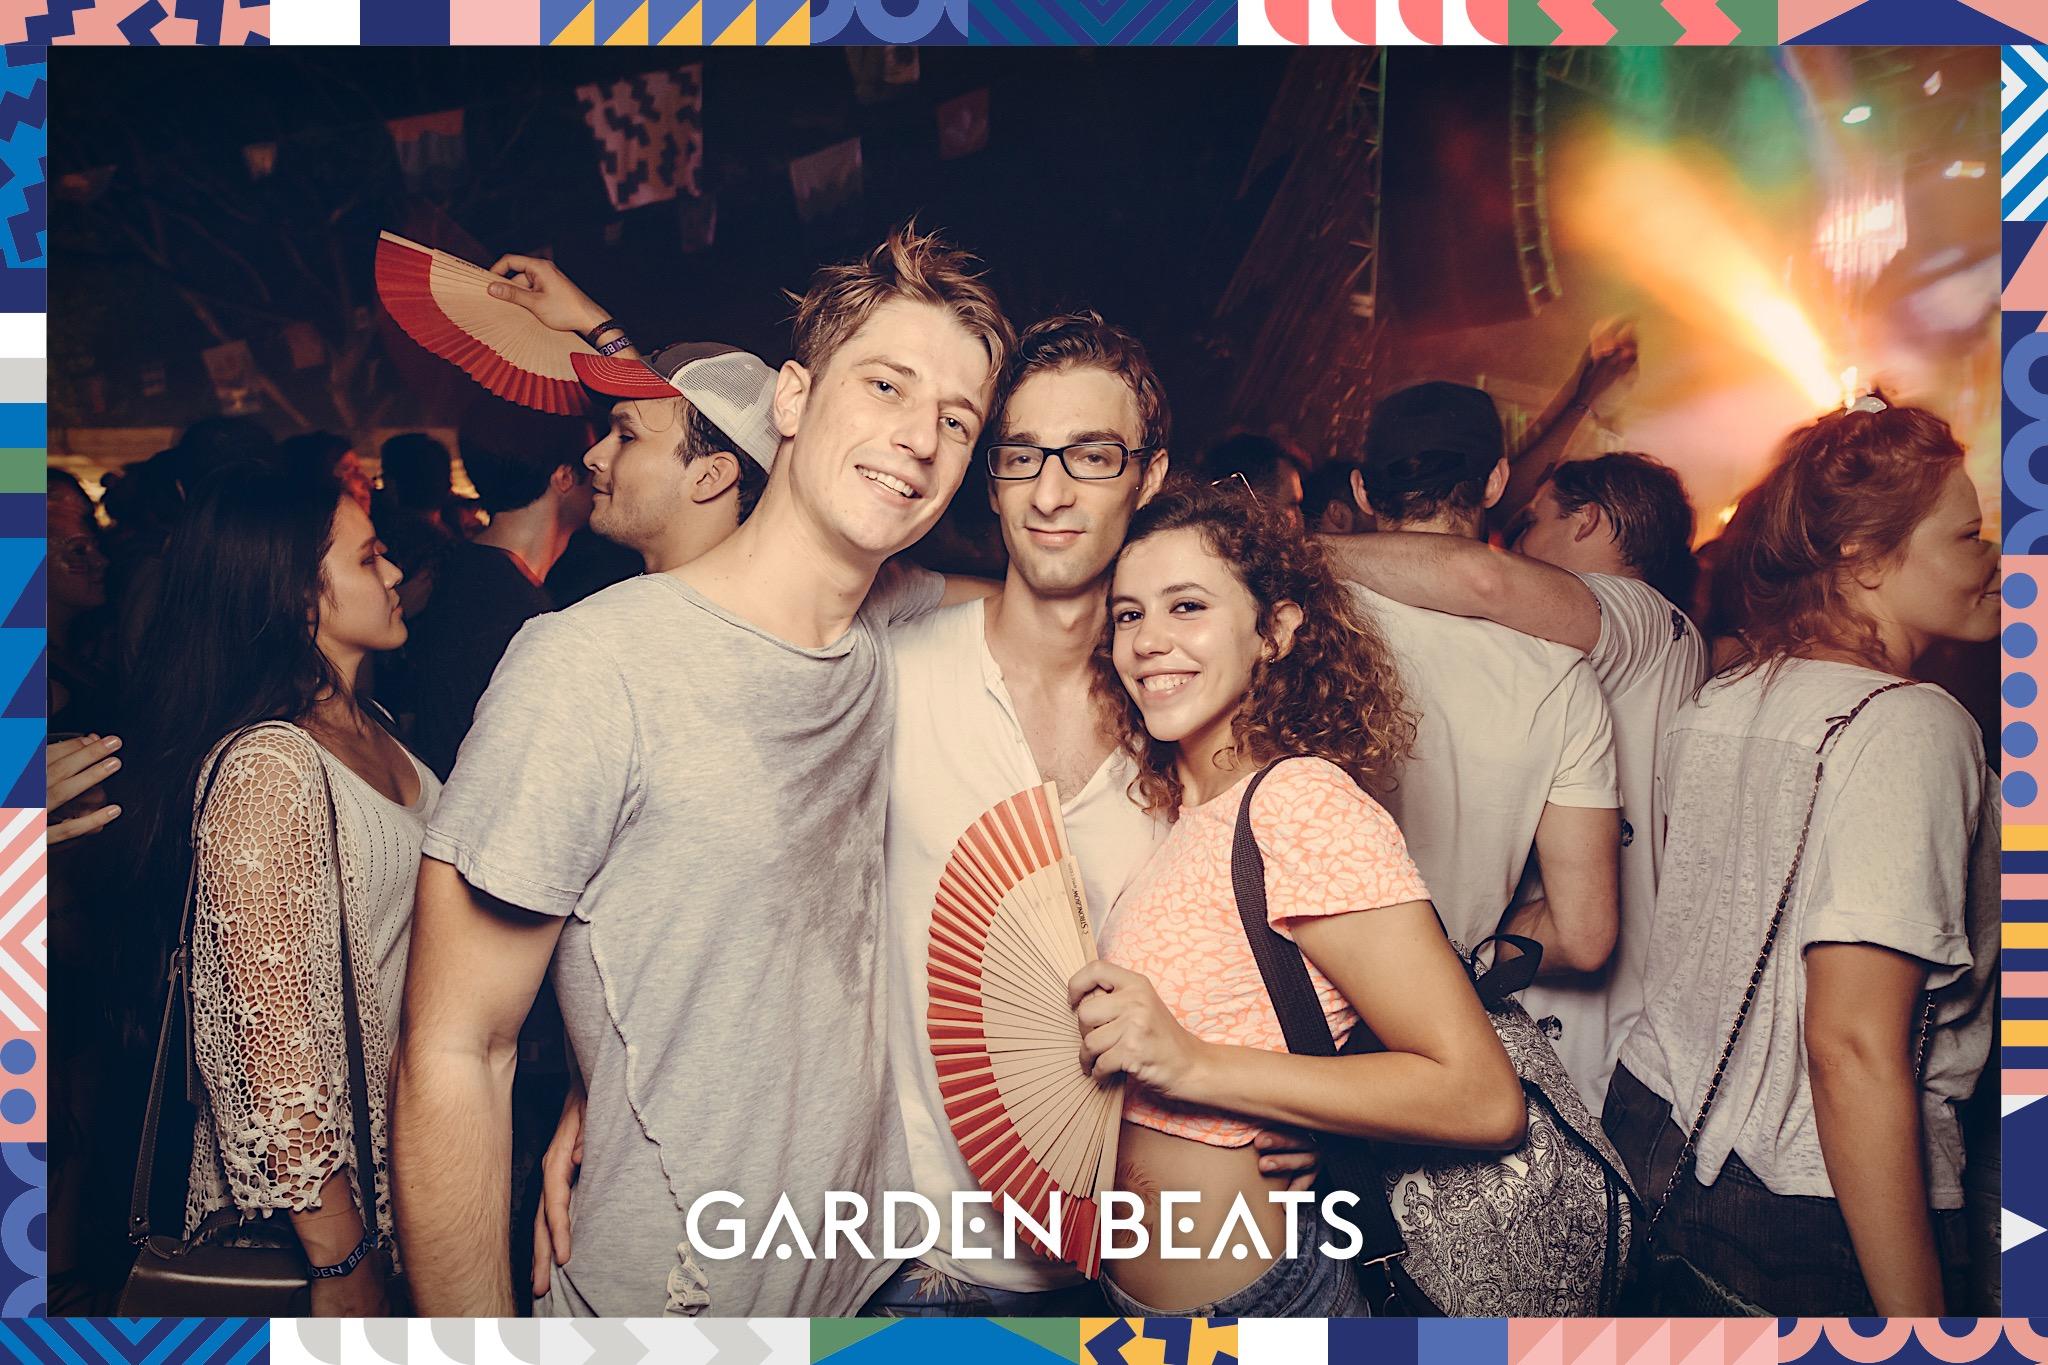 18032017_GardenBeats_Colossal881_WatermarkedGB.jpg